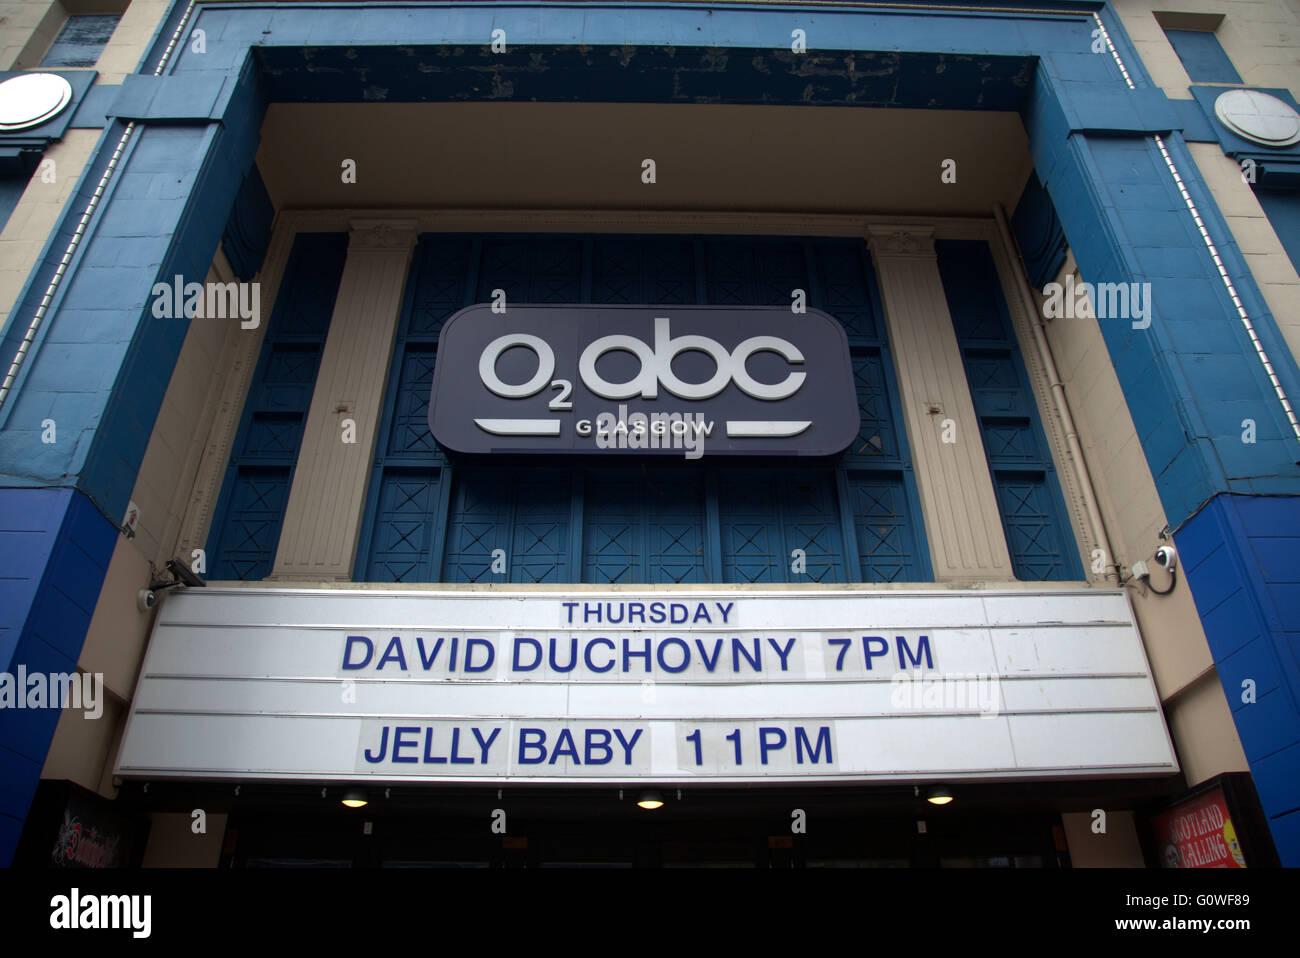 David Duchovny starts uk leg of his European tour in Glasgow O2 ABC venue on Thursday 12th may Glasgow, Scotand, - Stock Image